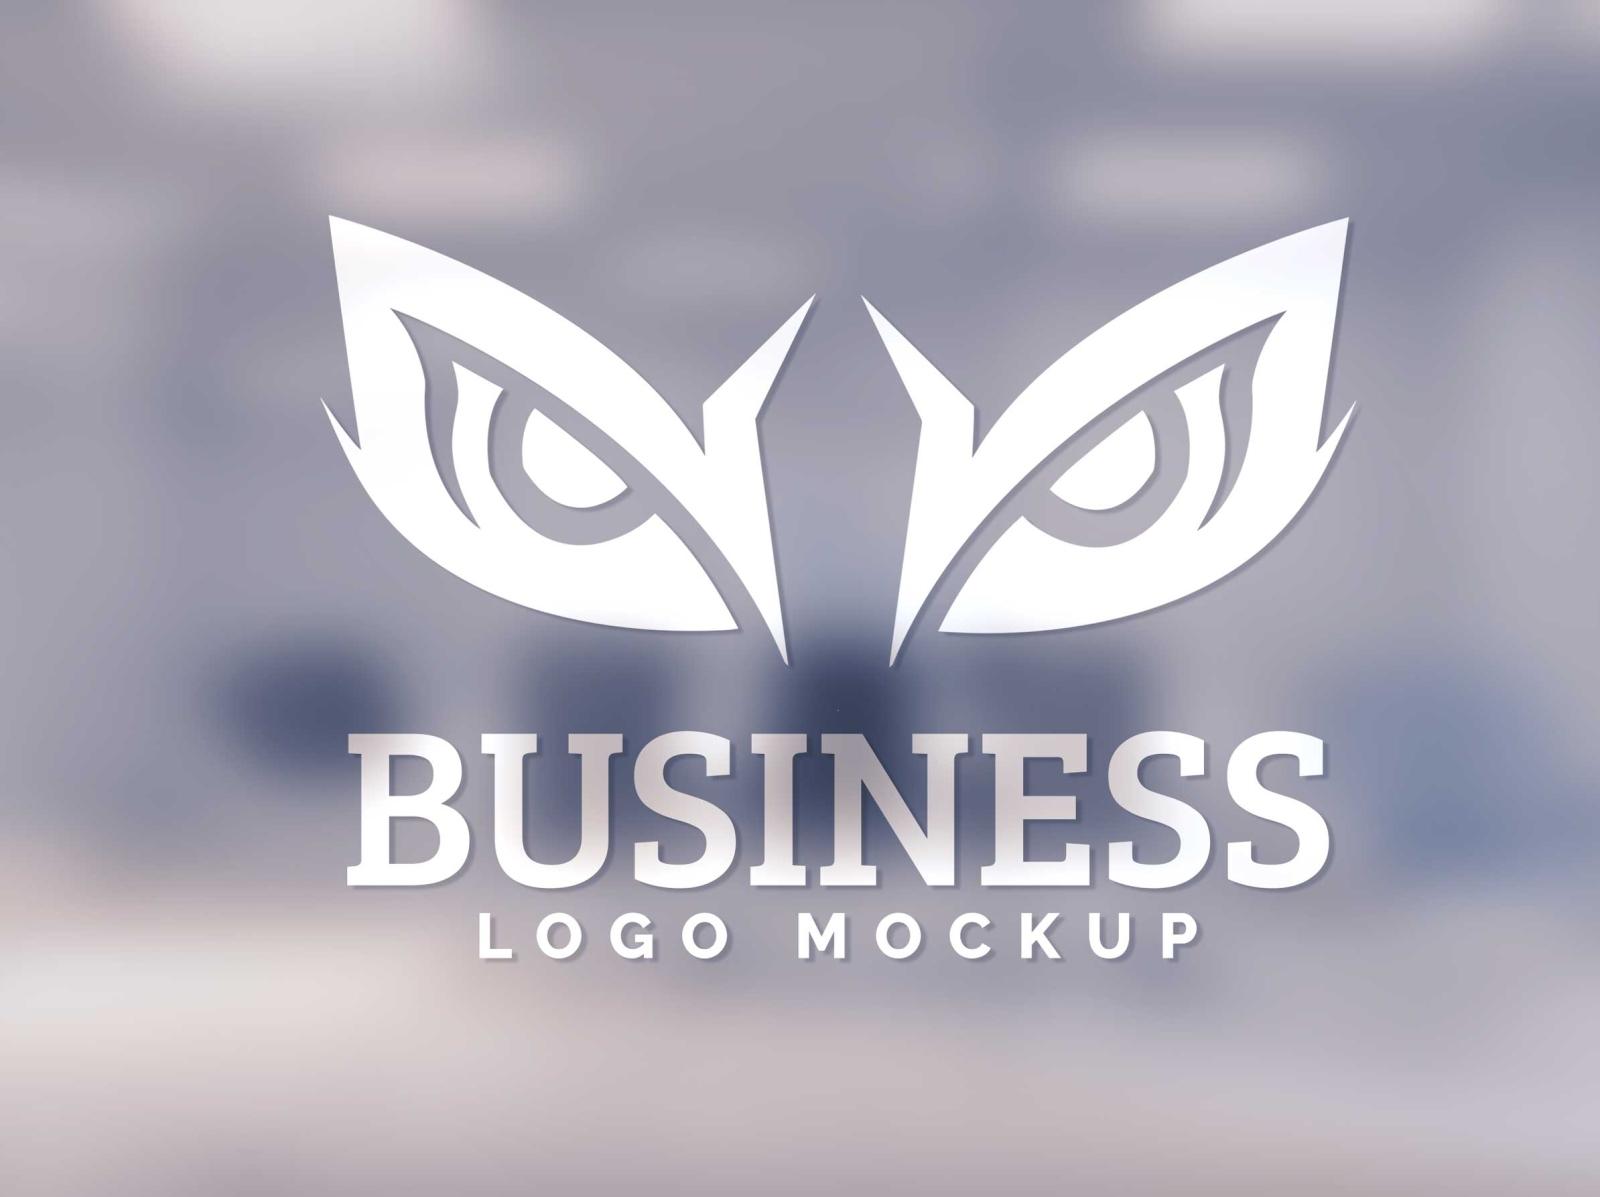 Free Blur Glass Wall Logo Mockup By Anuj Kumar On Dribbble